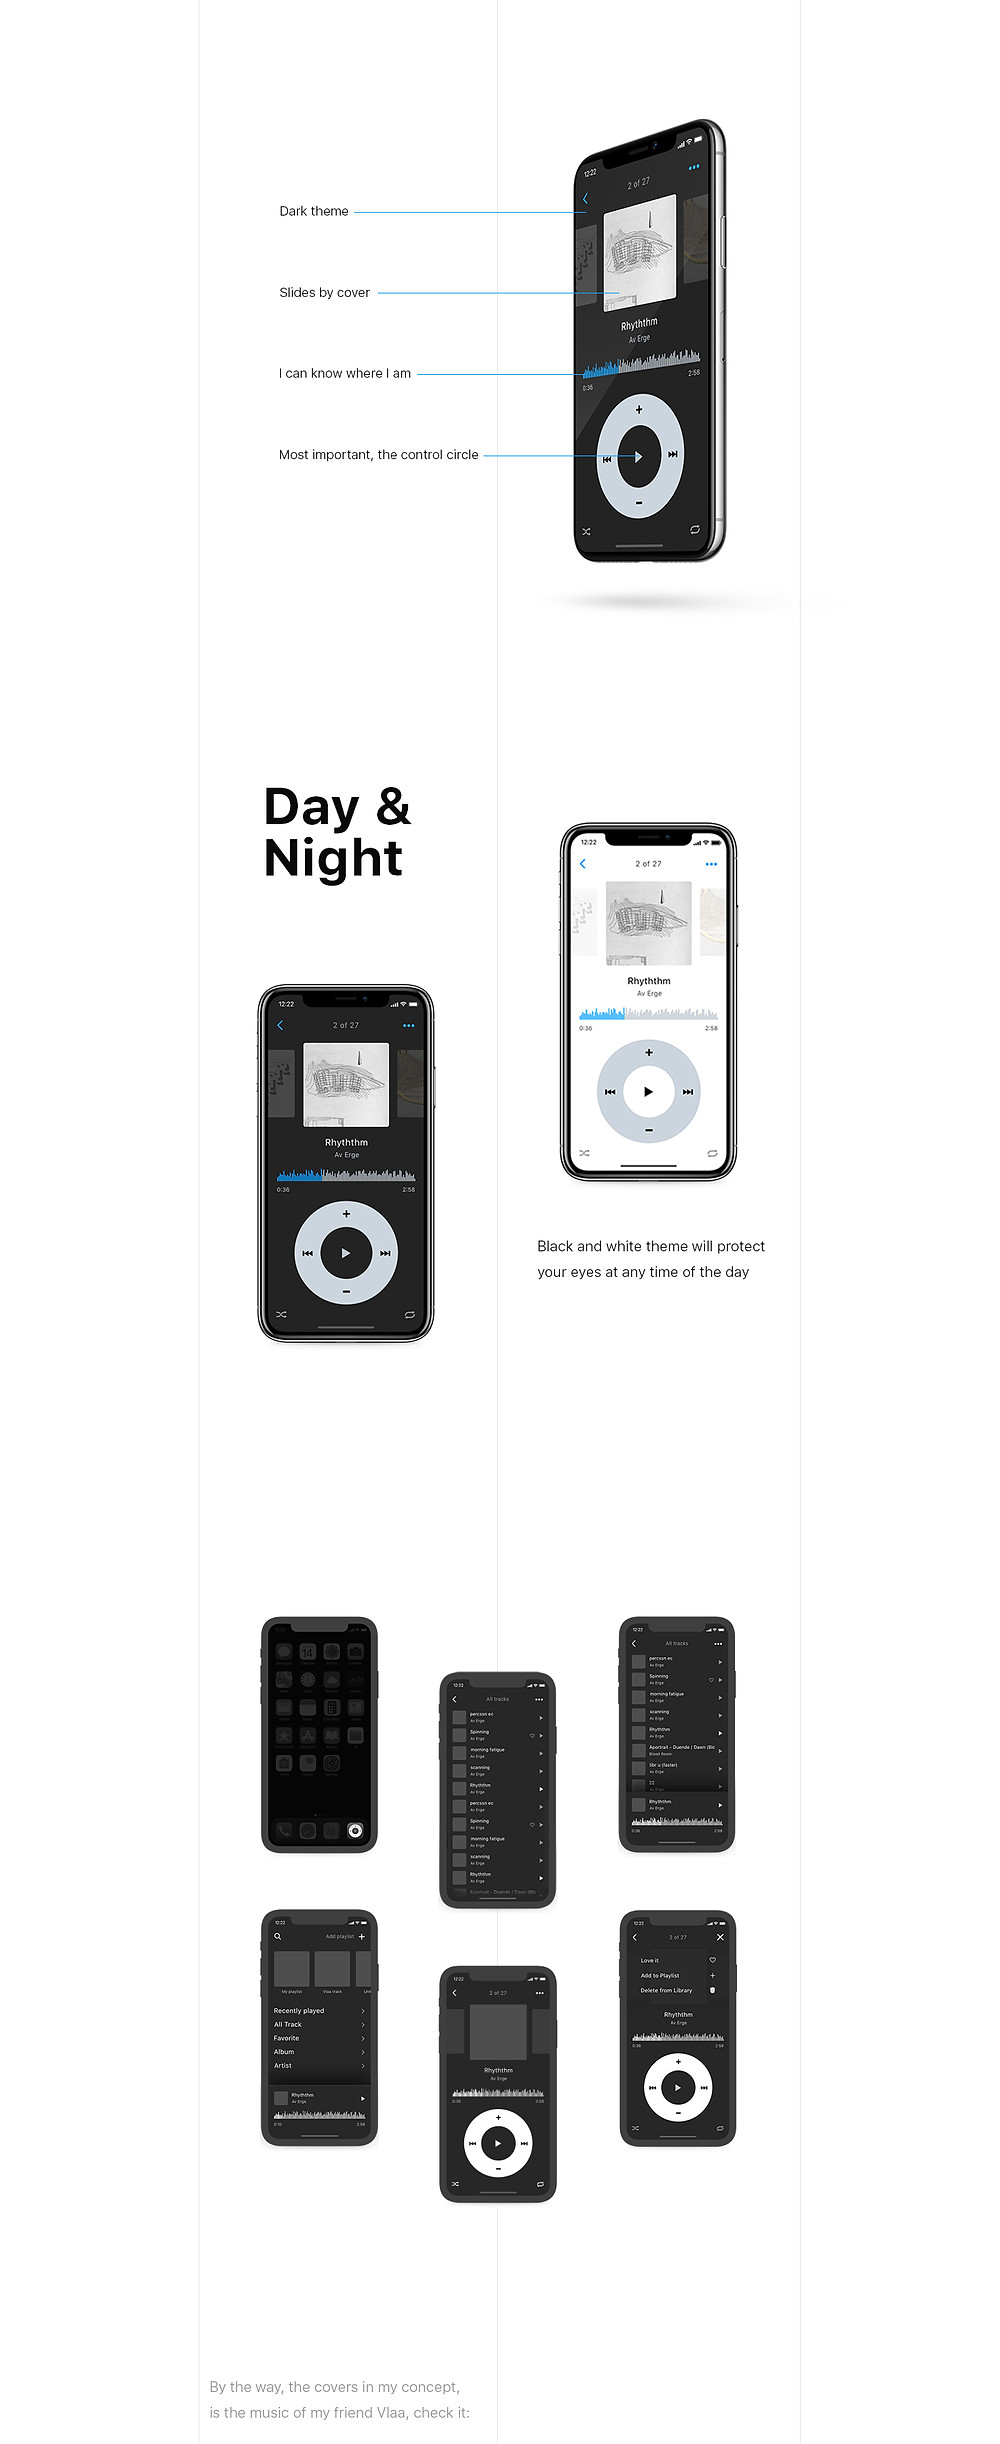 ipod,apple ipod,ipod touch 8th generation,ipod touch,ipod 2021,apple ipod 2021,new ipod,ipod new release,ipodkingcarter,ipod touch new,next ipod,apple concepts,apple new product,techblood,ipod video,ipod os